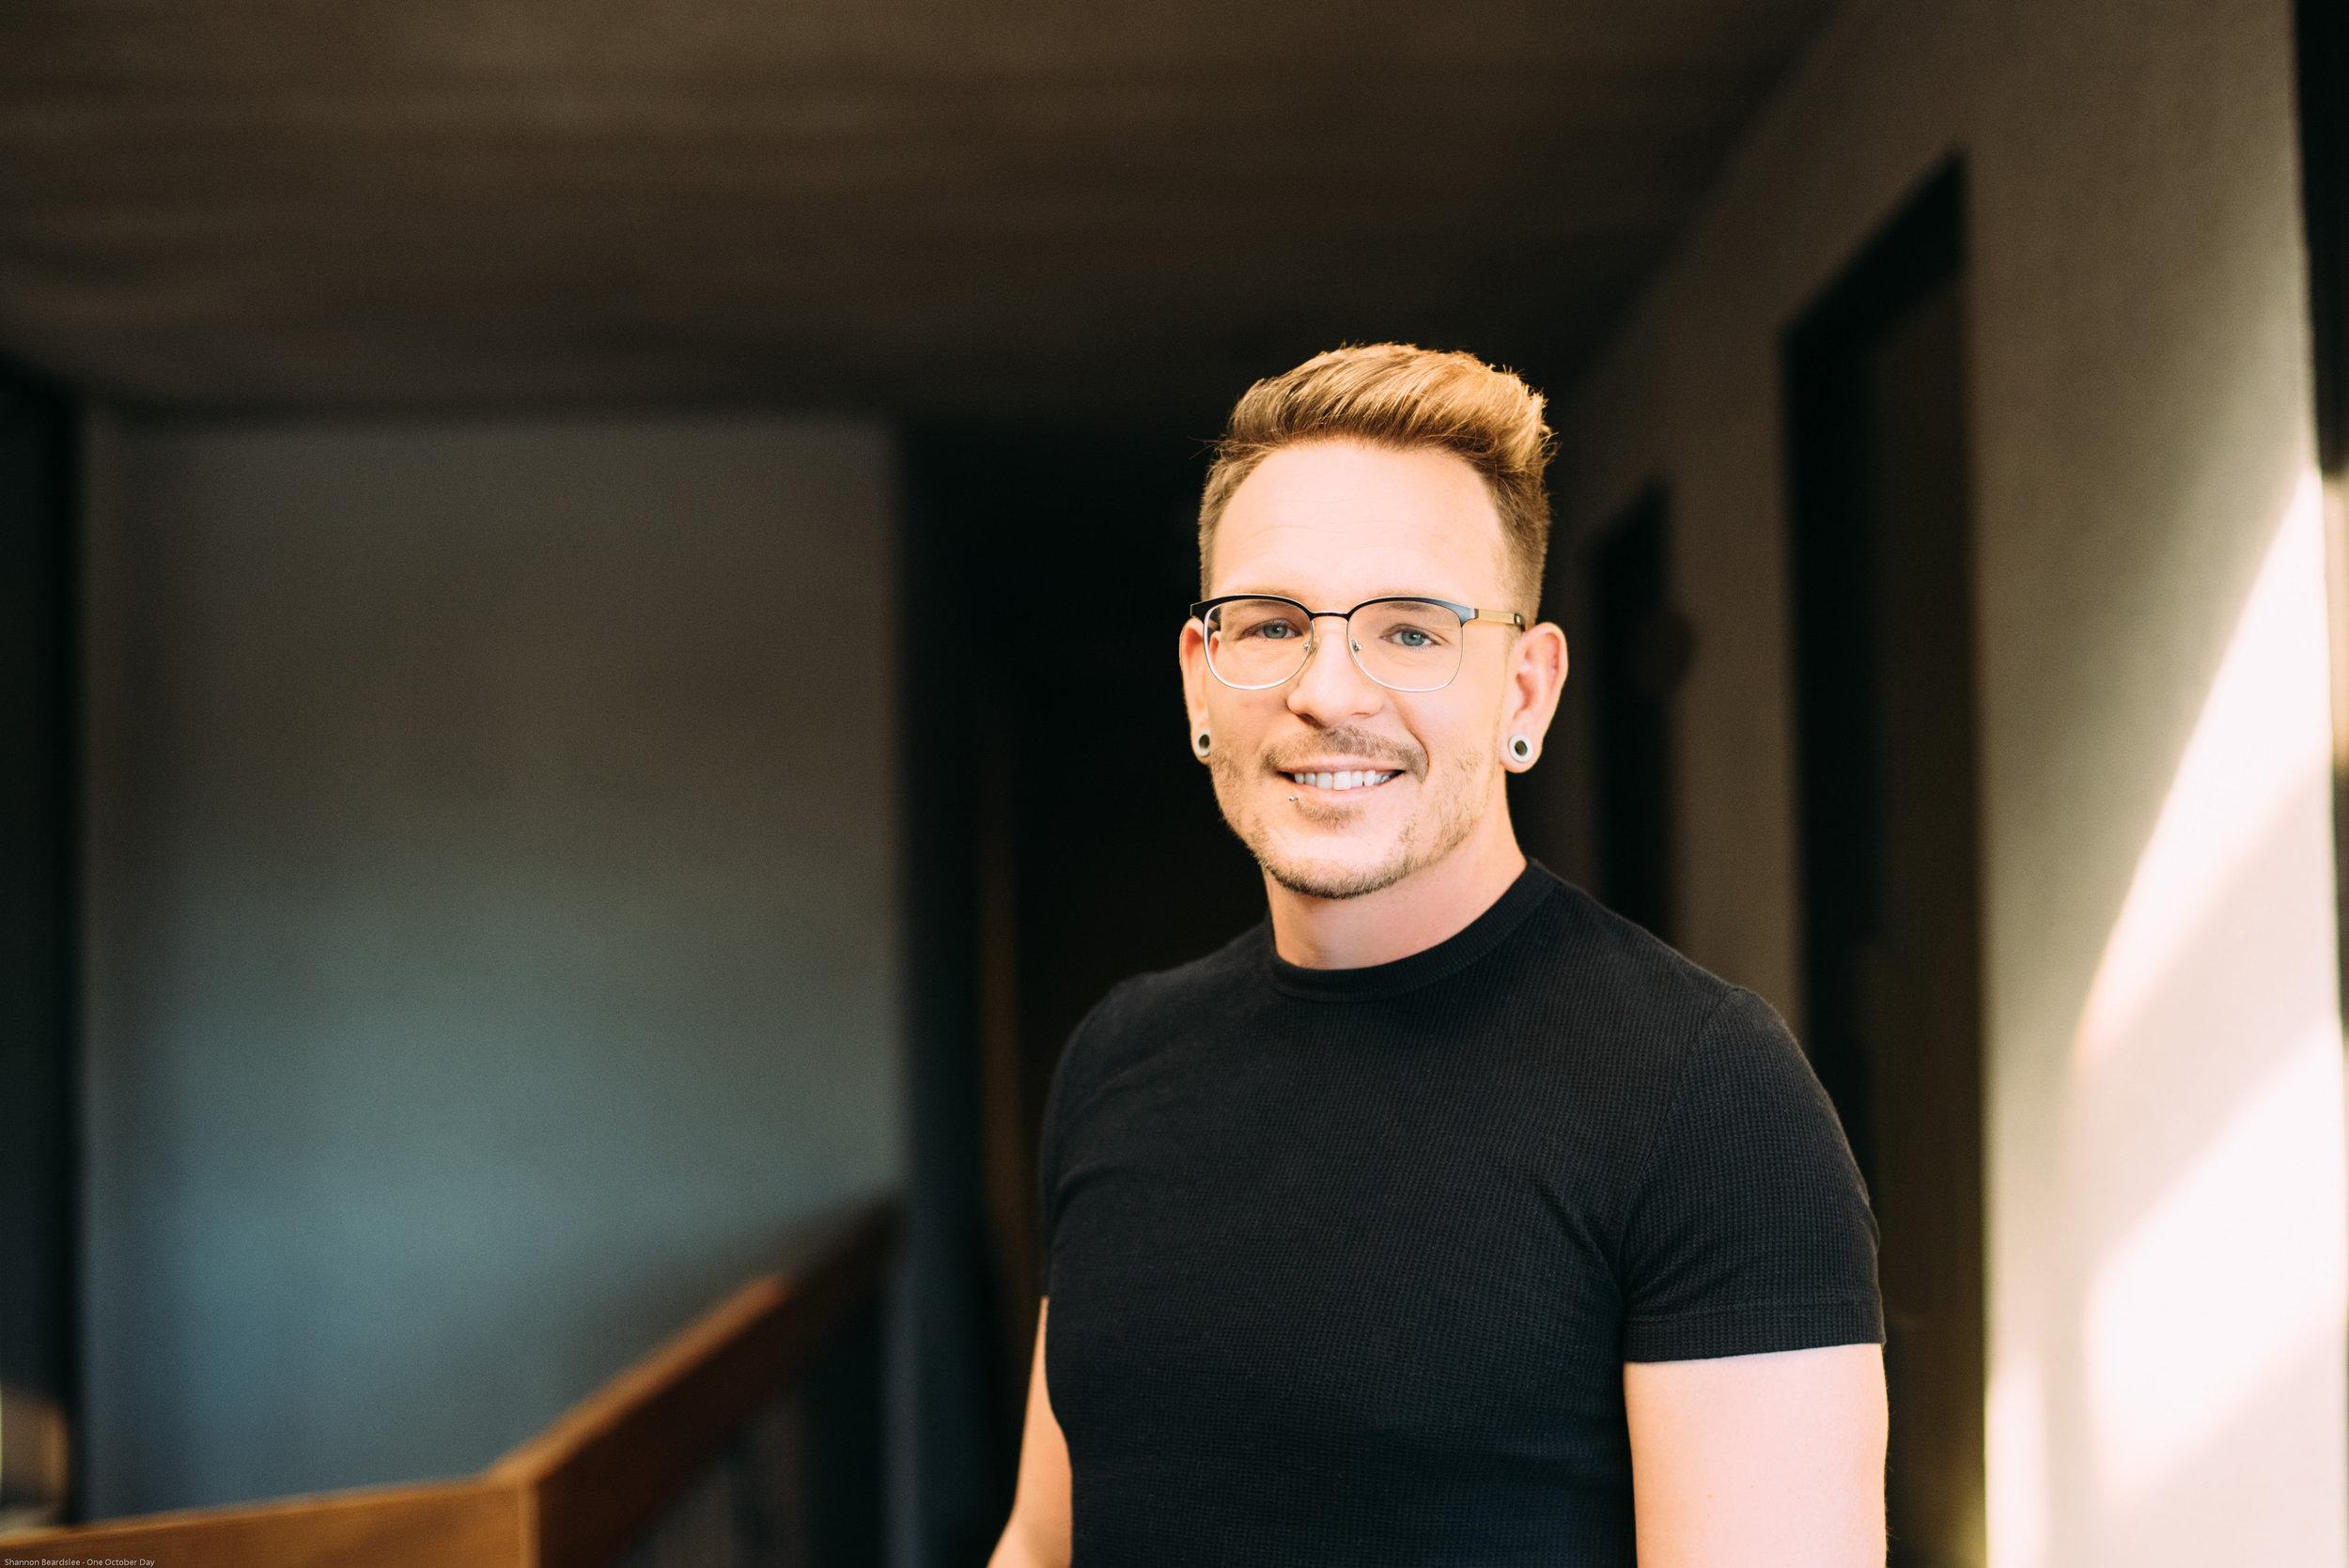 Nic White, Hair Professional